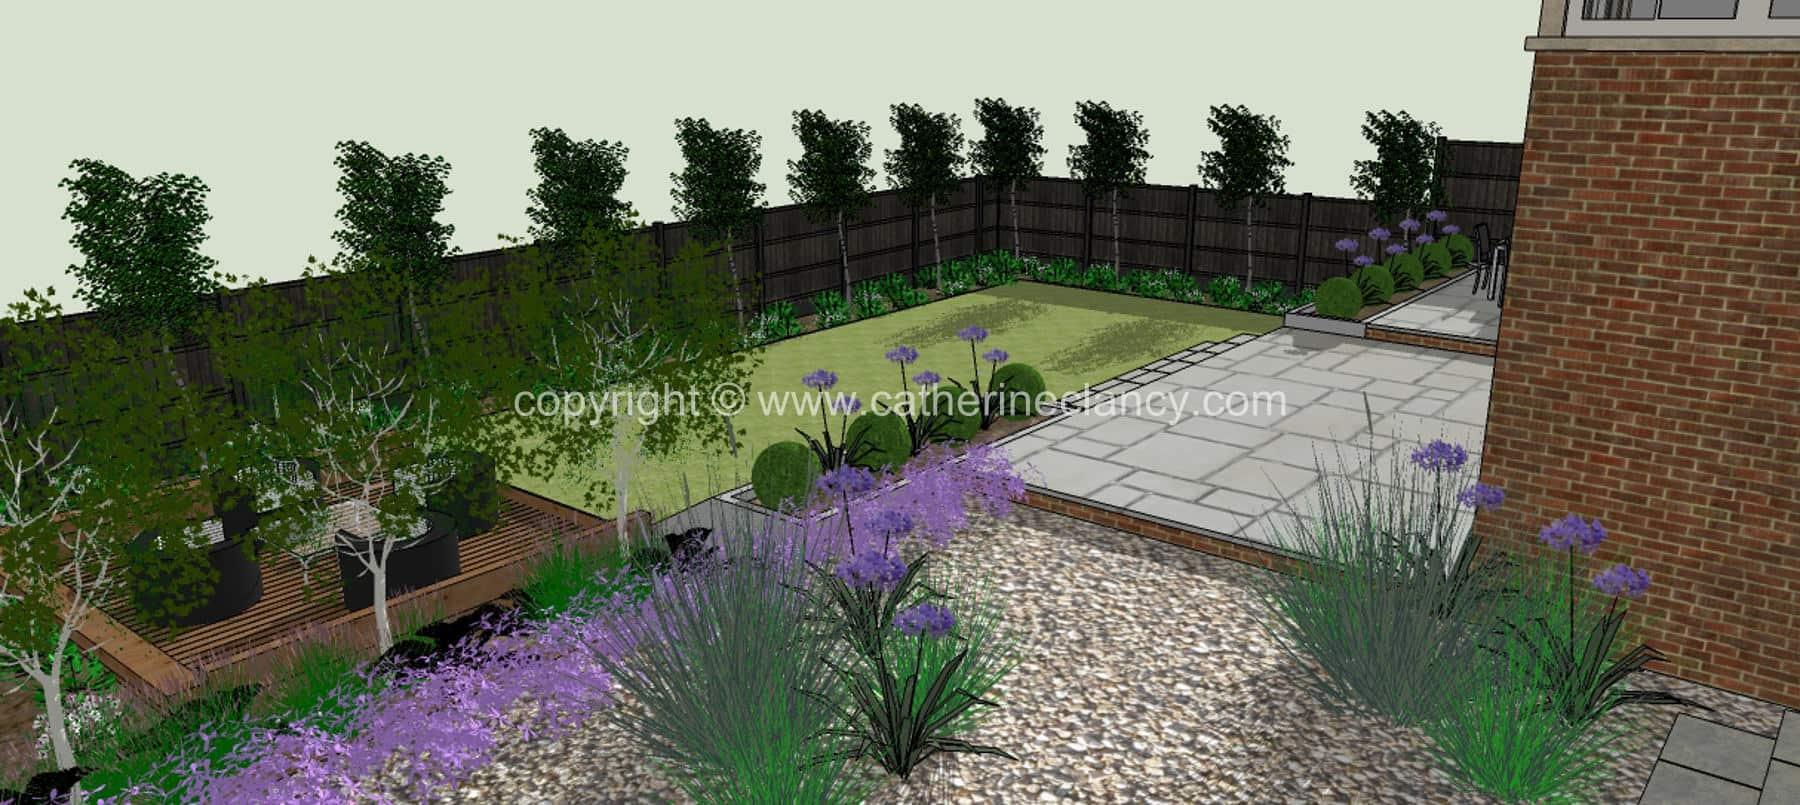 hendon-grand-design-garden-4